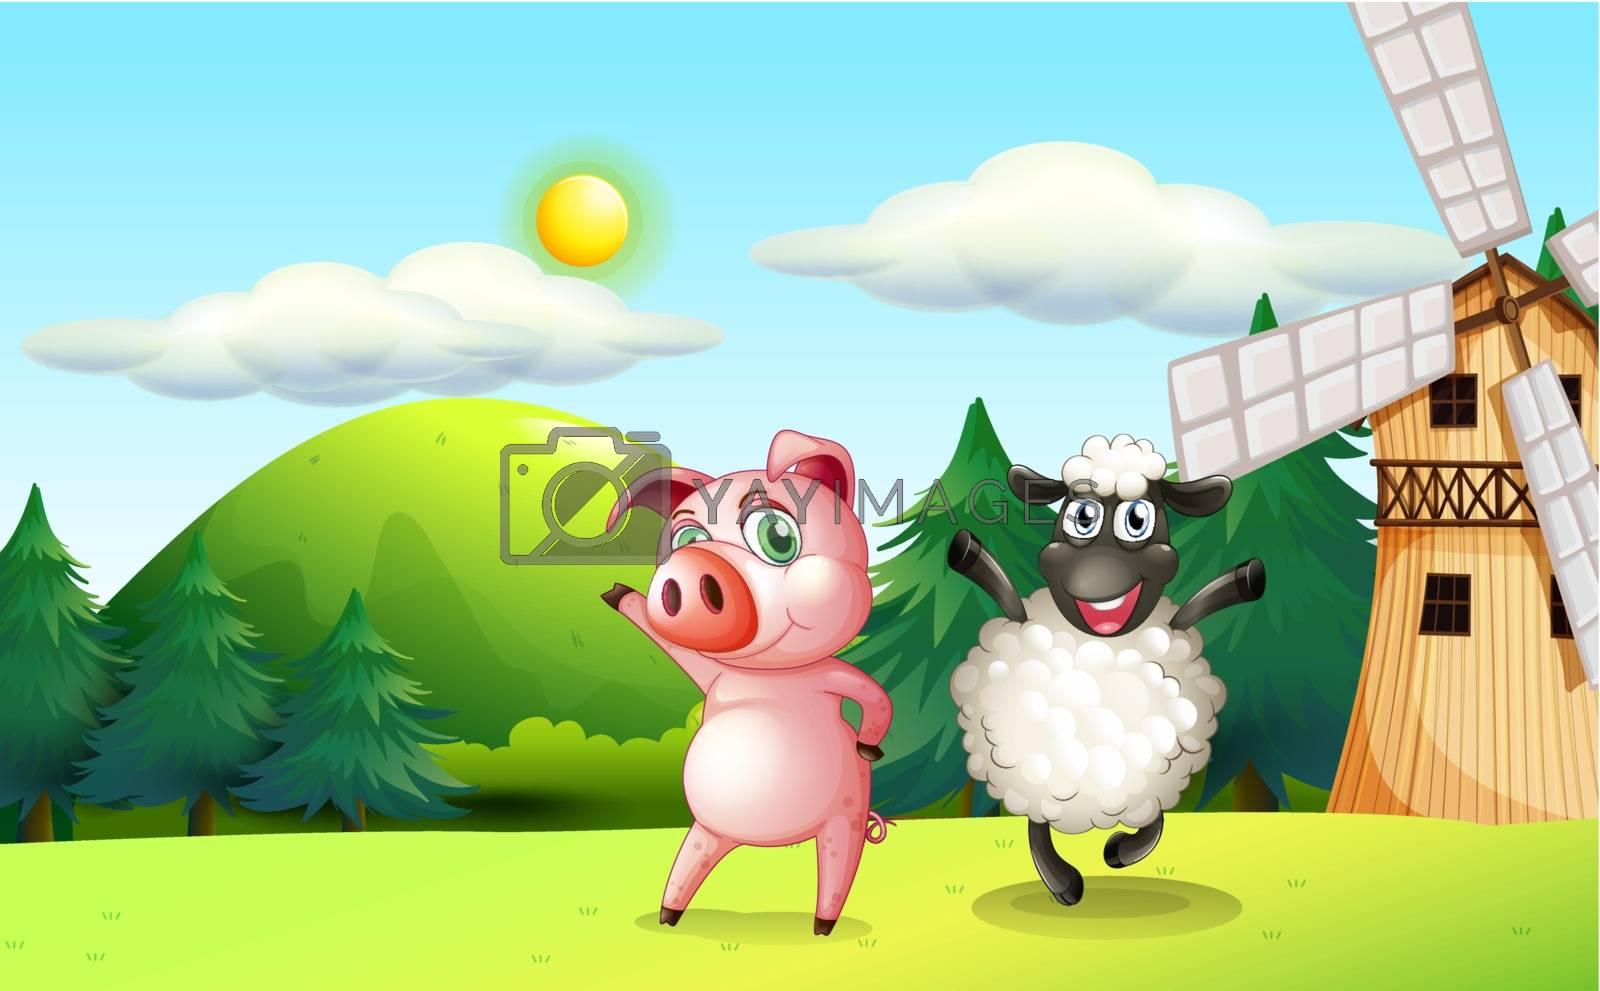 Illustration of the farm animals dancing near the windmill